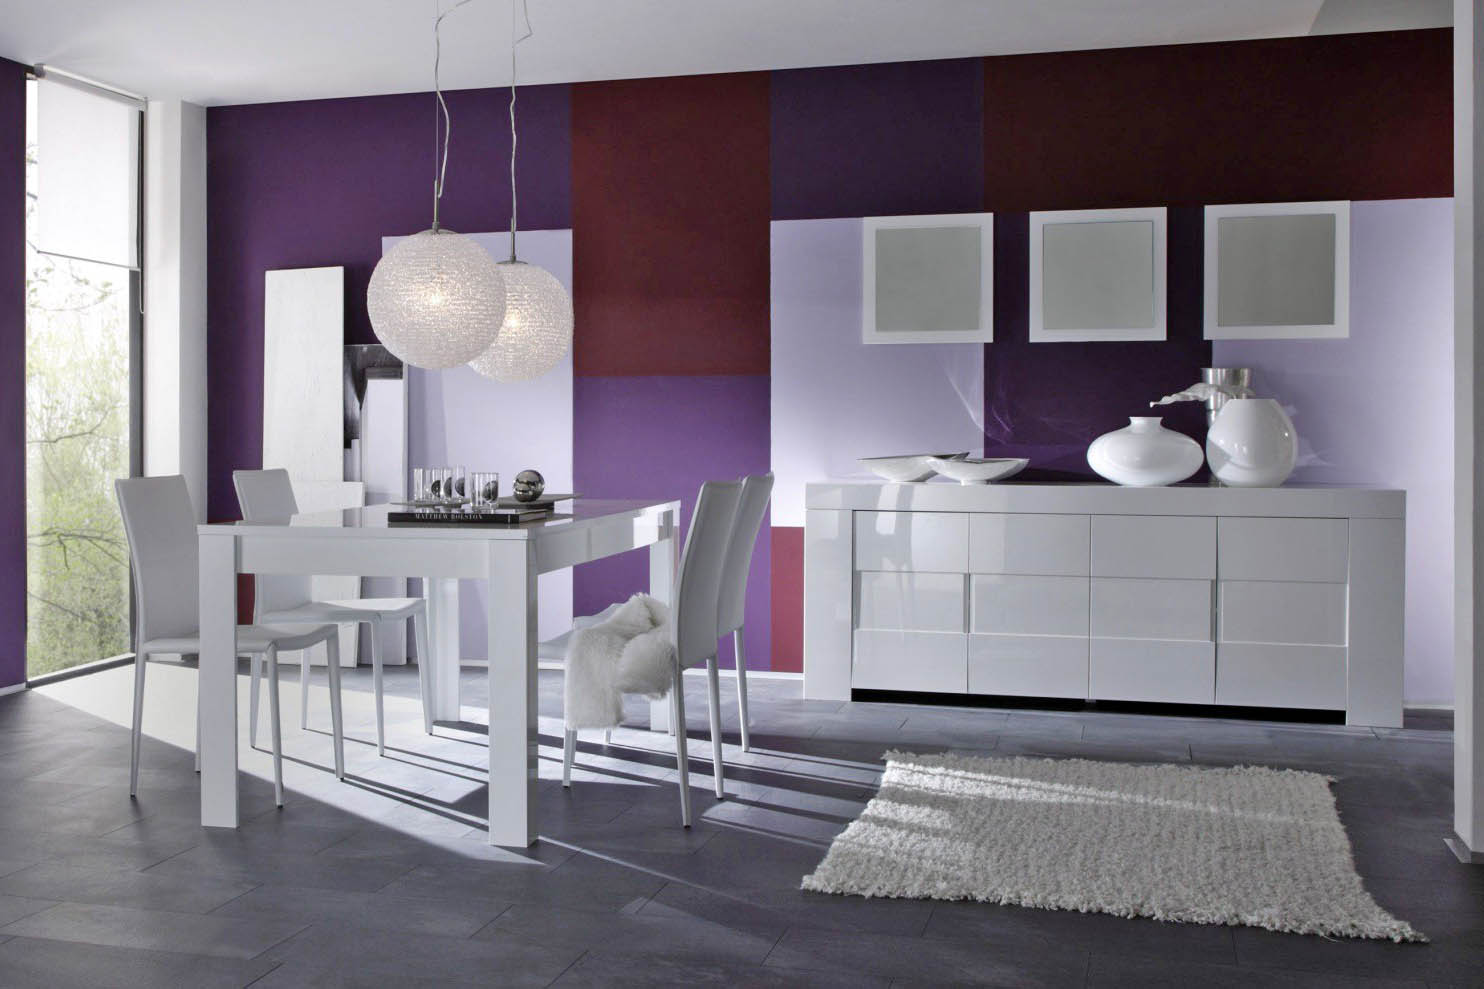 Salle manger meubl et design blanc meuble et d coration marseille mobi - Meuble de salle a manger ikea ...